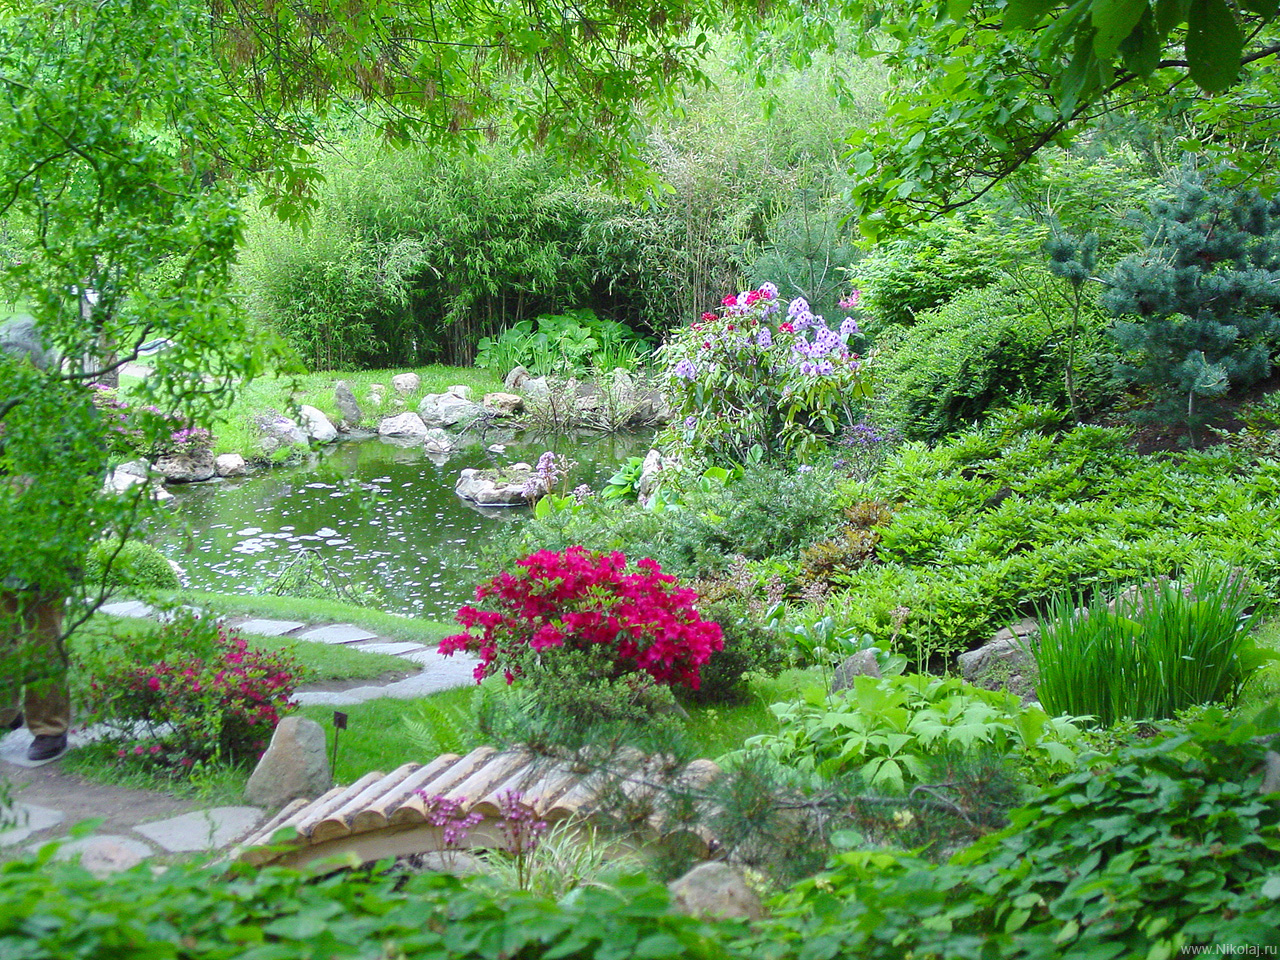 http://gardenphoto.narod.ru/photo/garden.nikolaj.ru_2754_1280.jpg